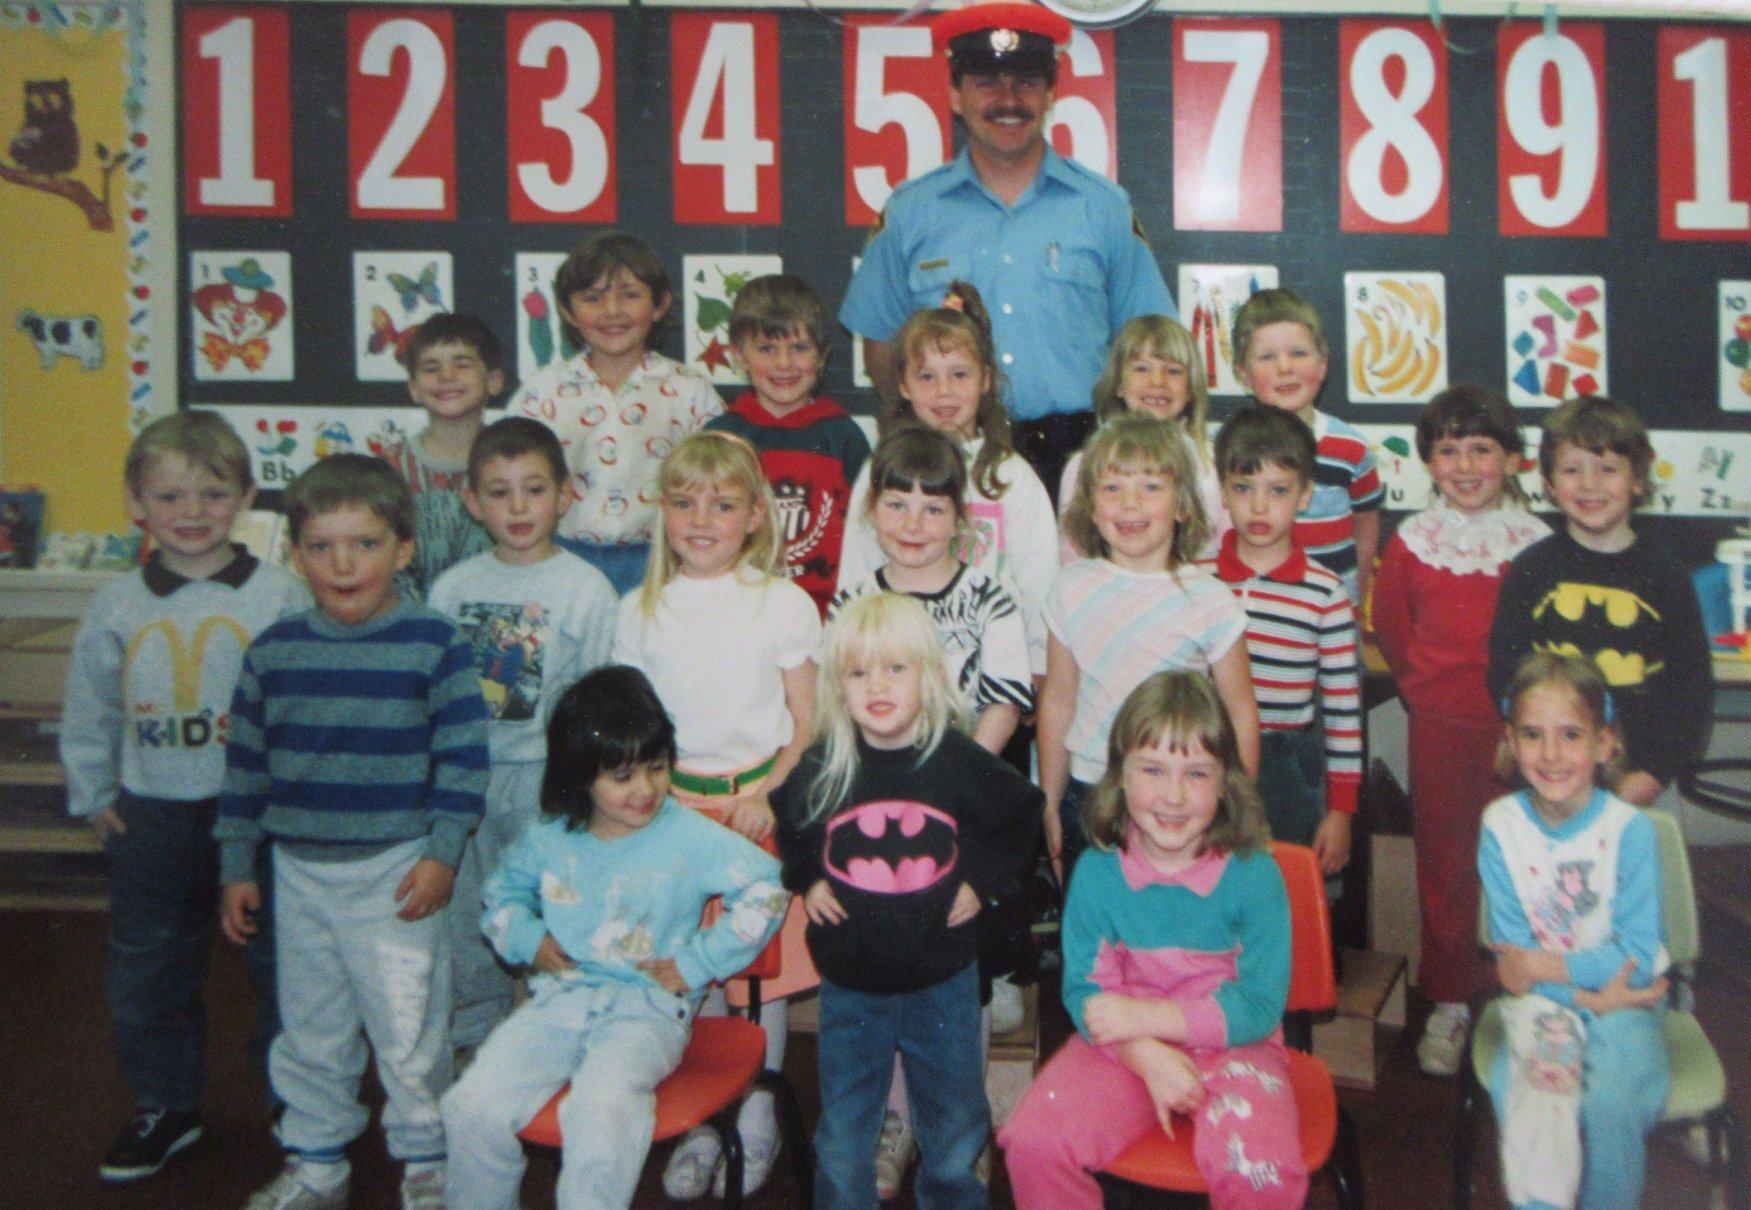 Earl Prentice School 1989-90.jpg